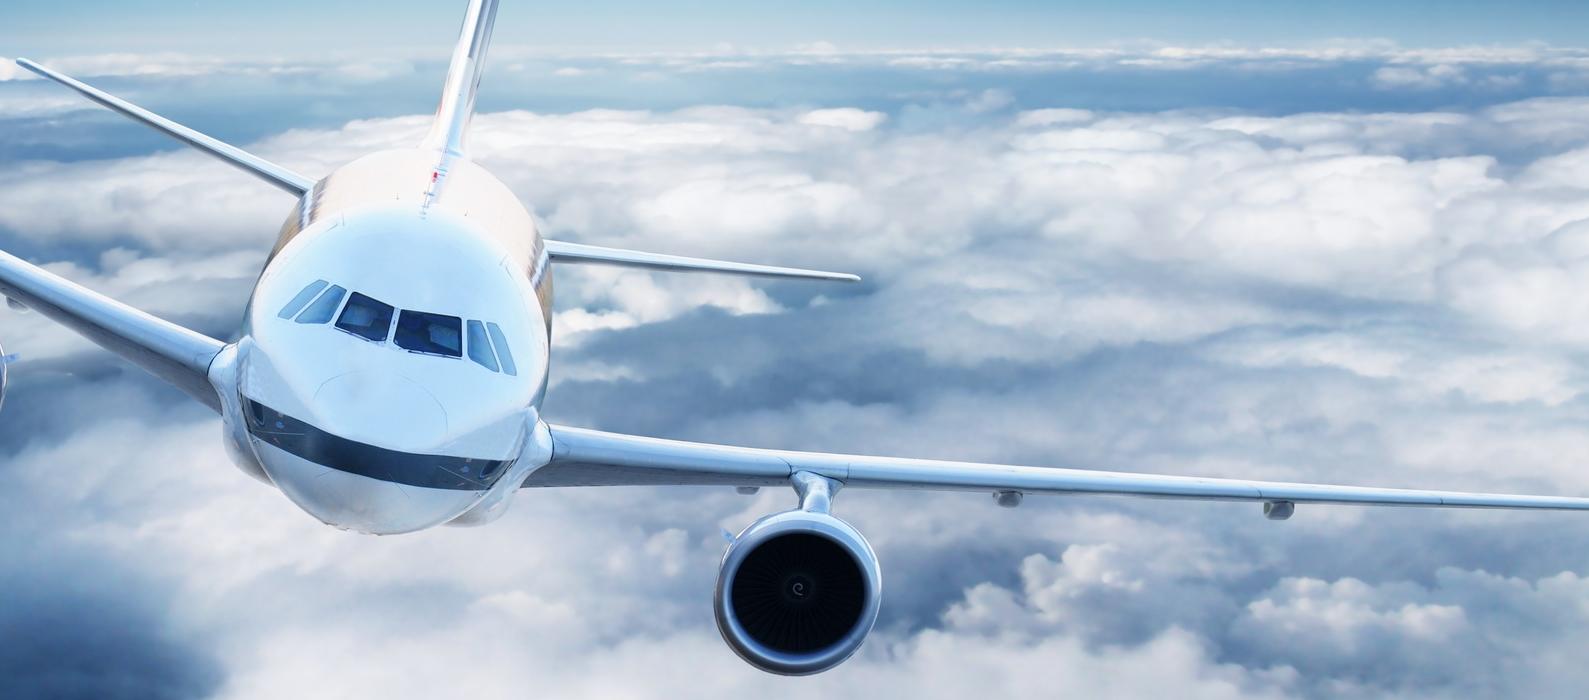 Выкуп авиабилетов онлайн